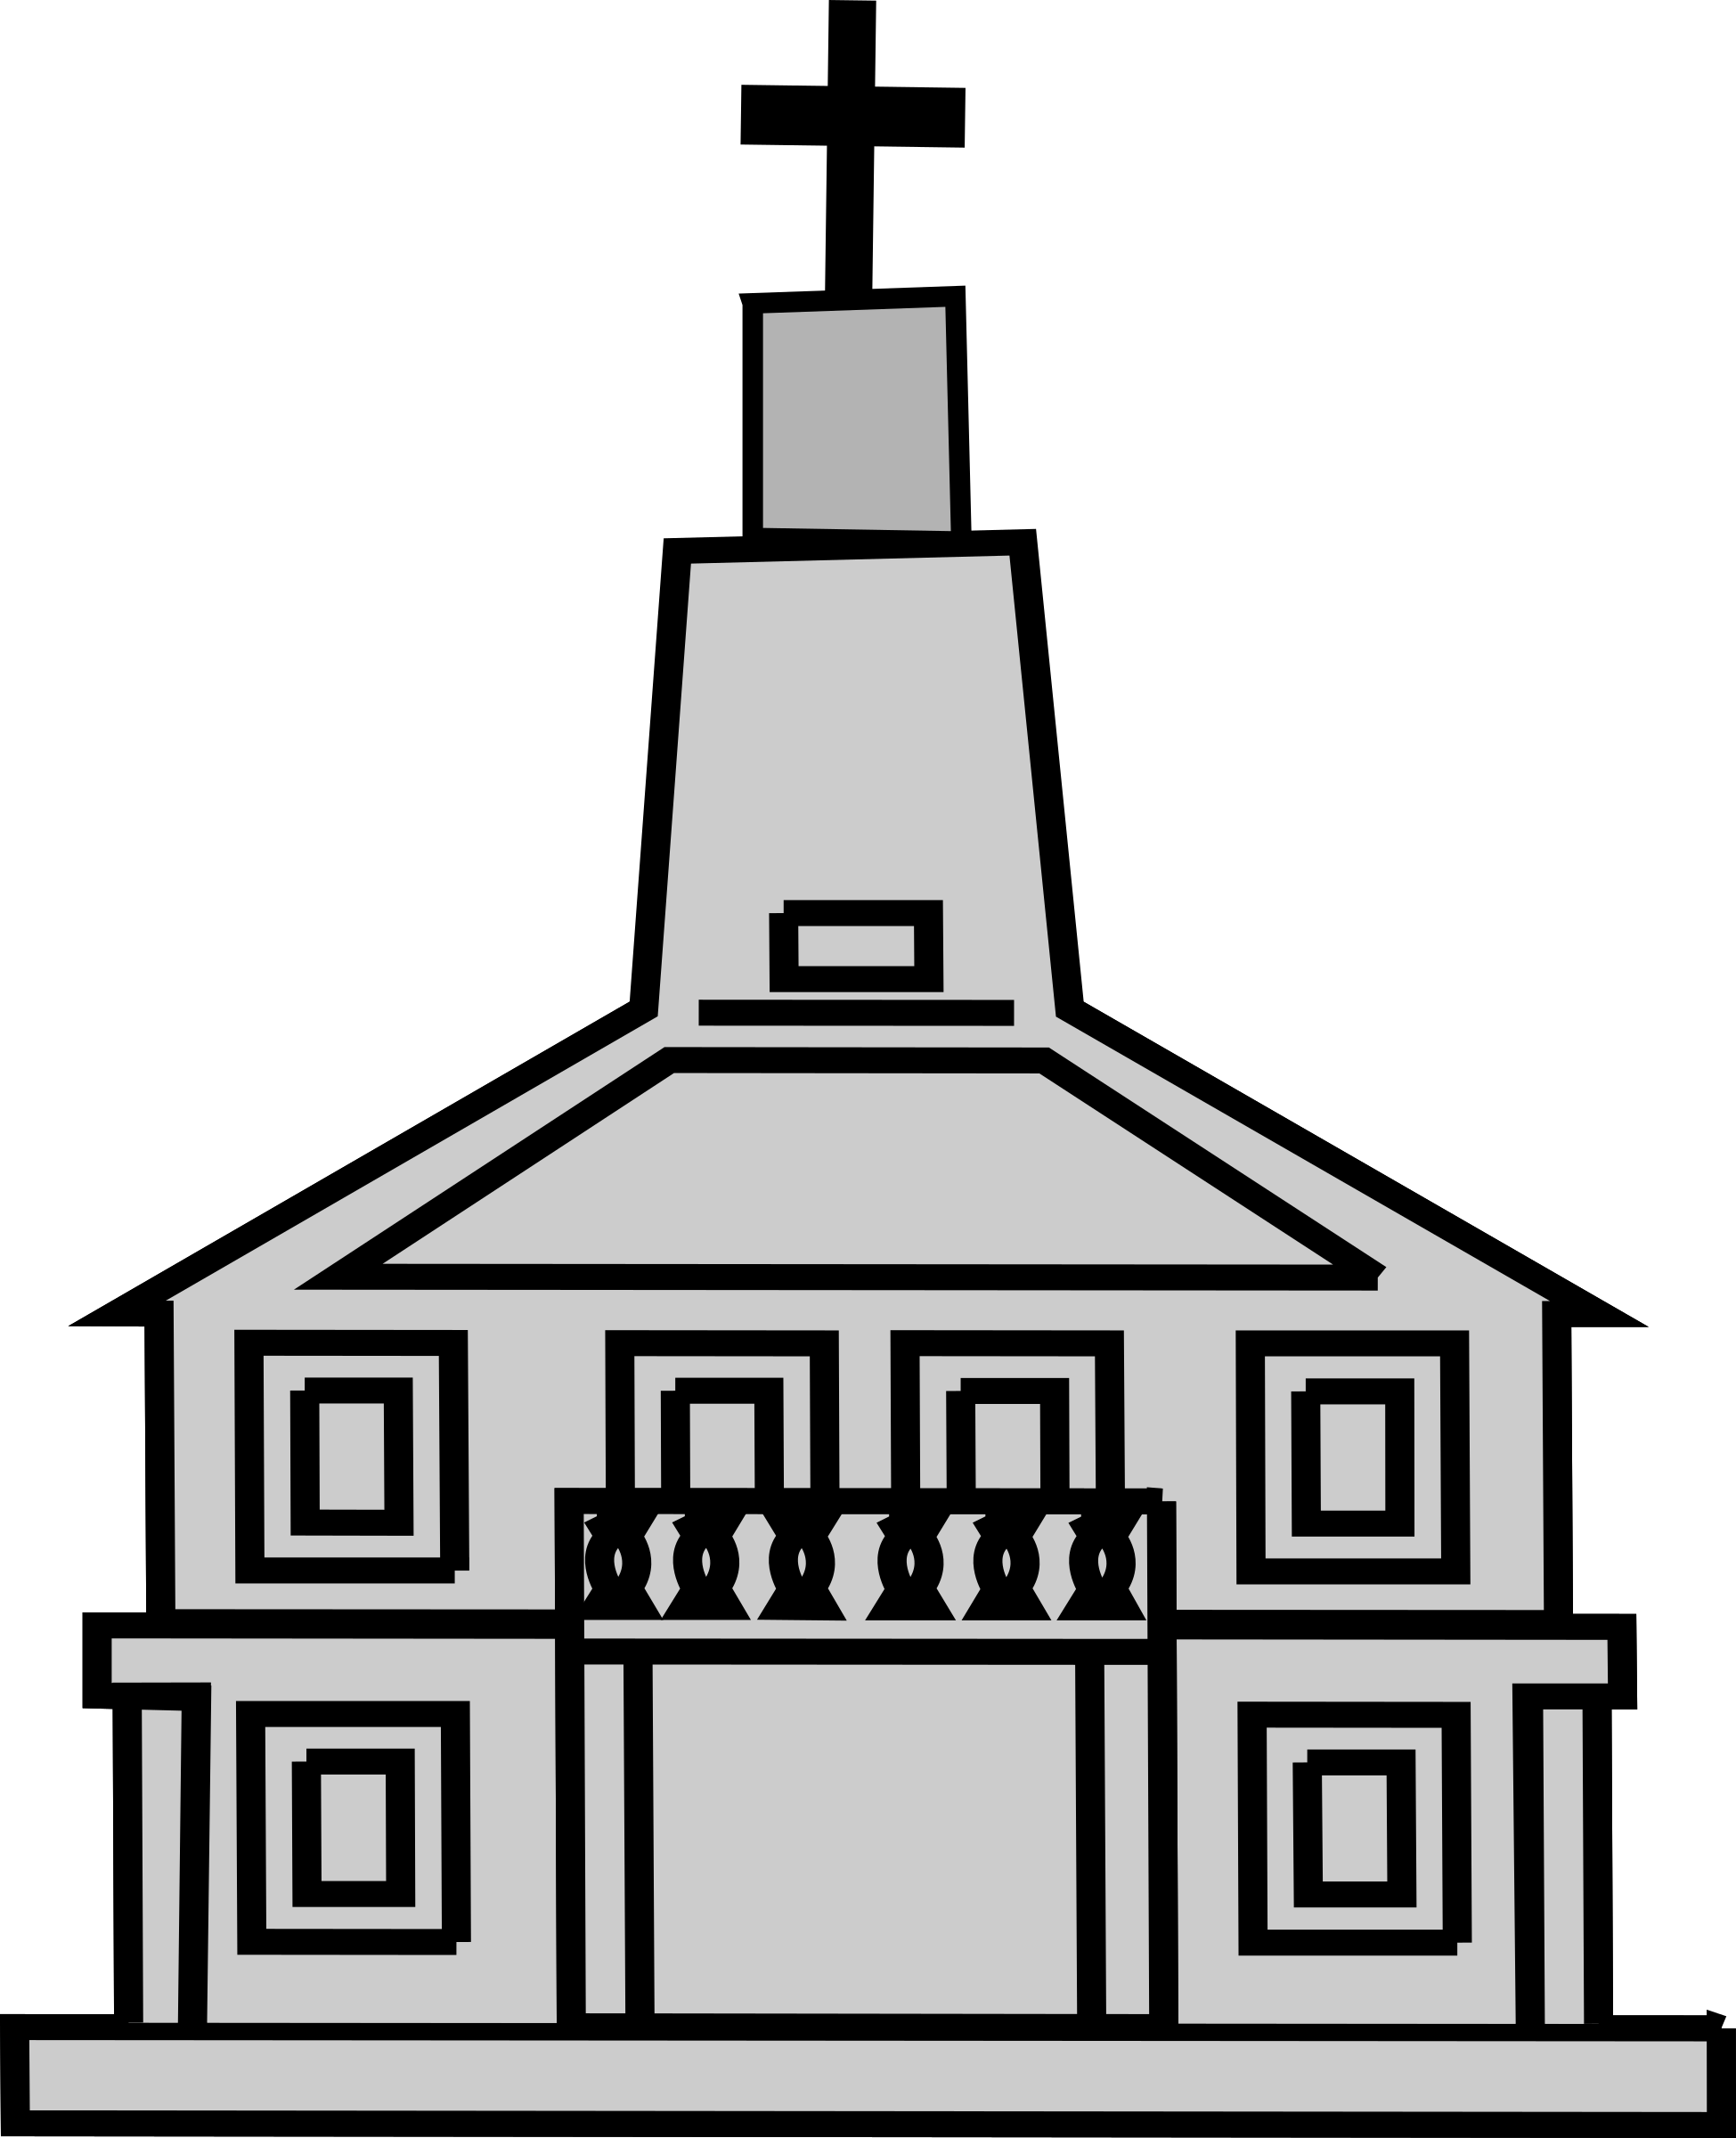 Clipart png church. Big image